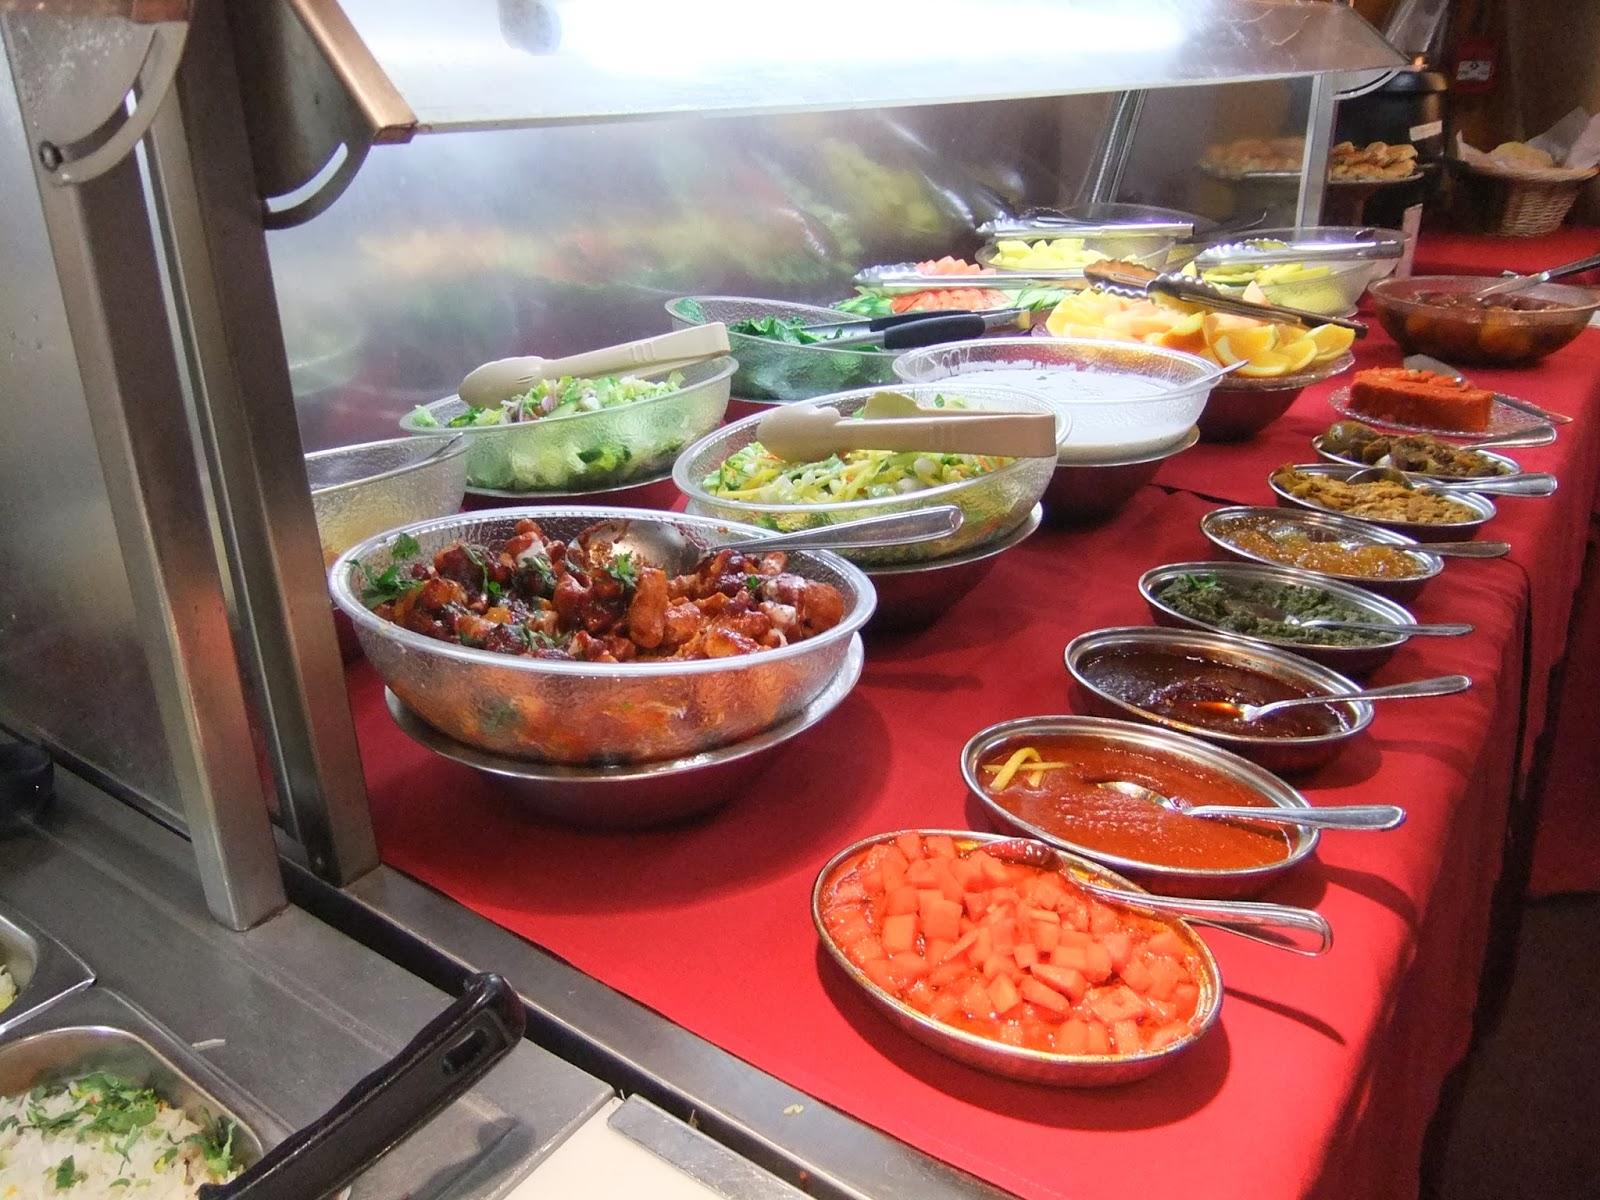 little india pauly food trek rh paulyfoodtrek blogspot com little india lunch buffet price little india lunch buffet denver